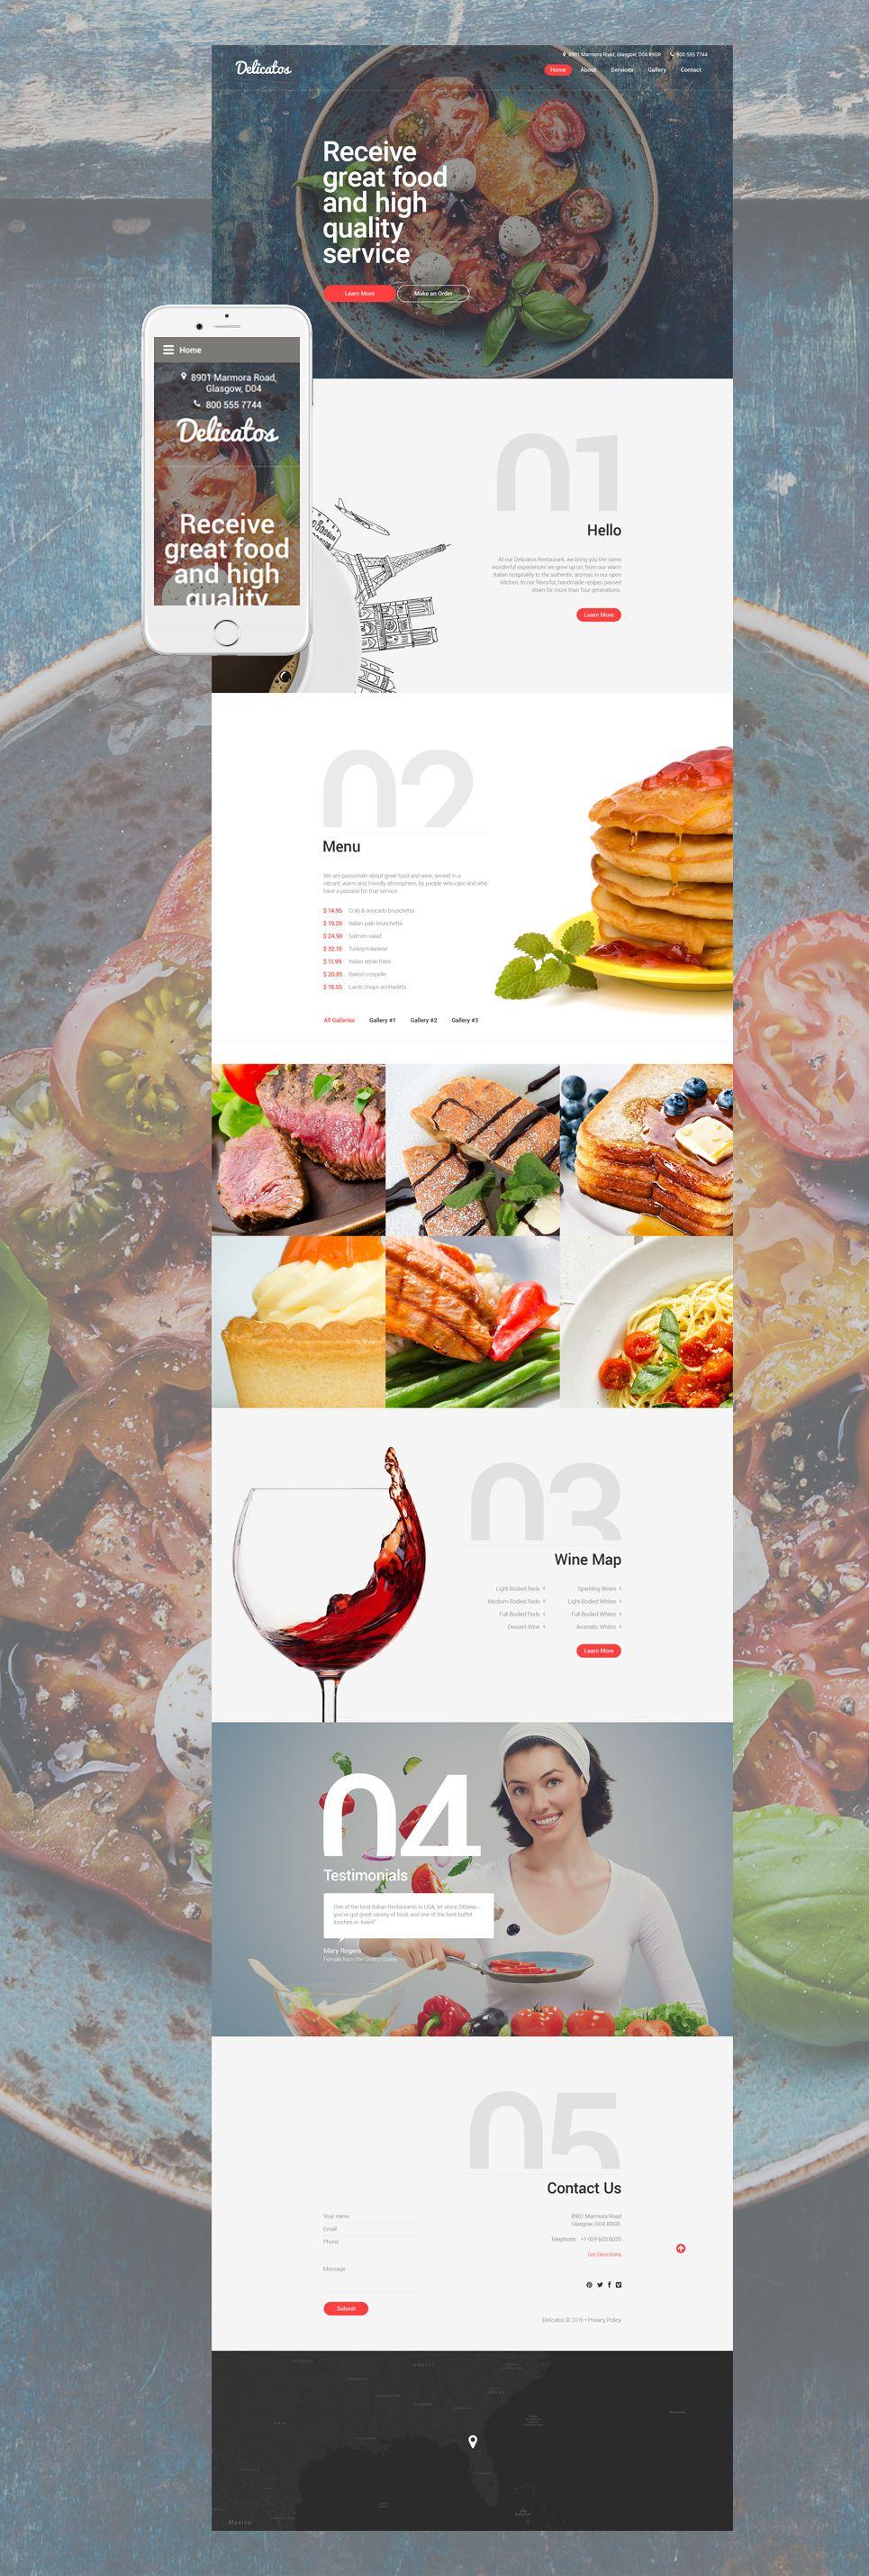 Italian Restaurant Web Template